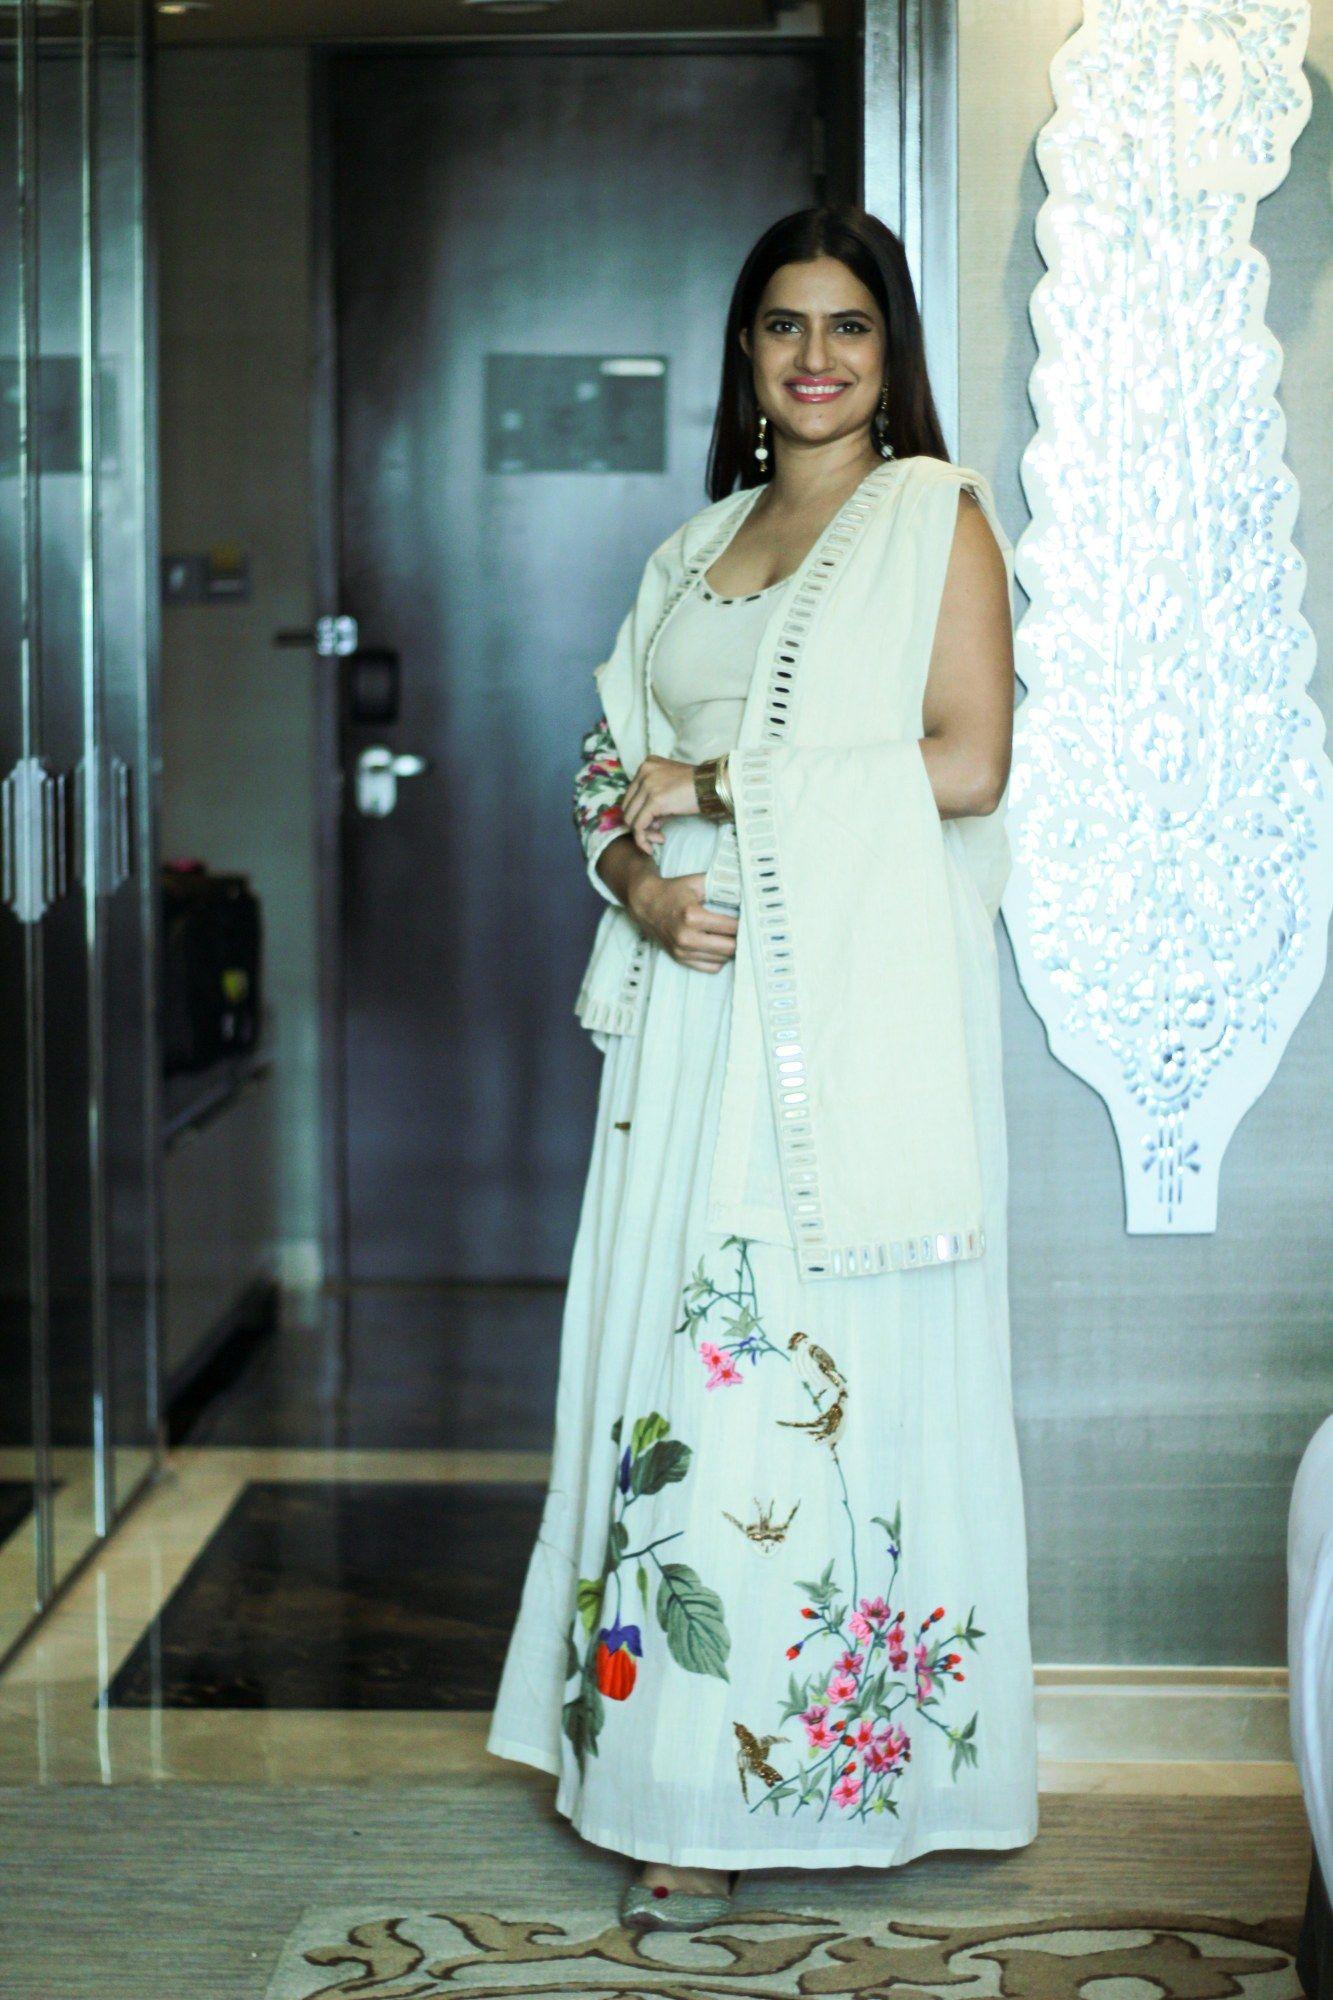 khadi mirror embroidered sari blouse and stole navratri sona mohpatra in purvi doshi s khadi collection celebrating women s day